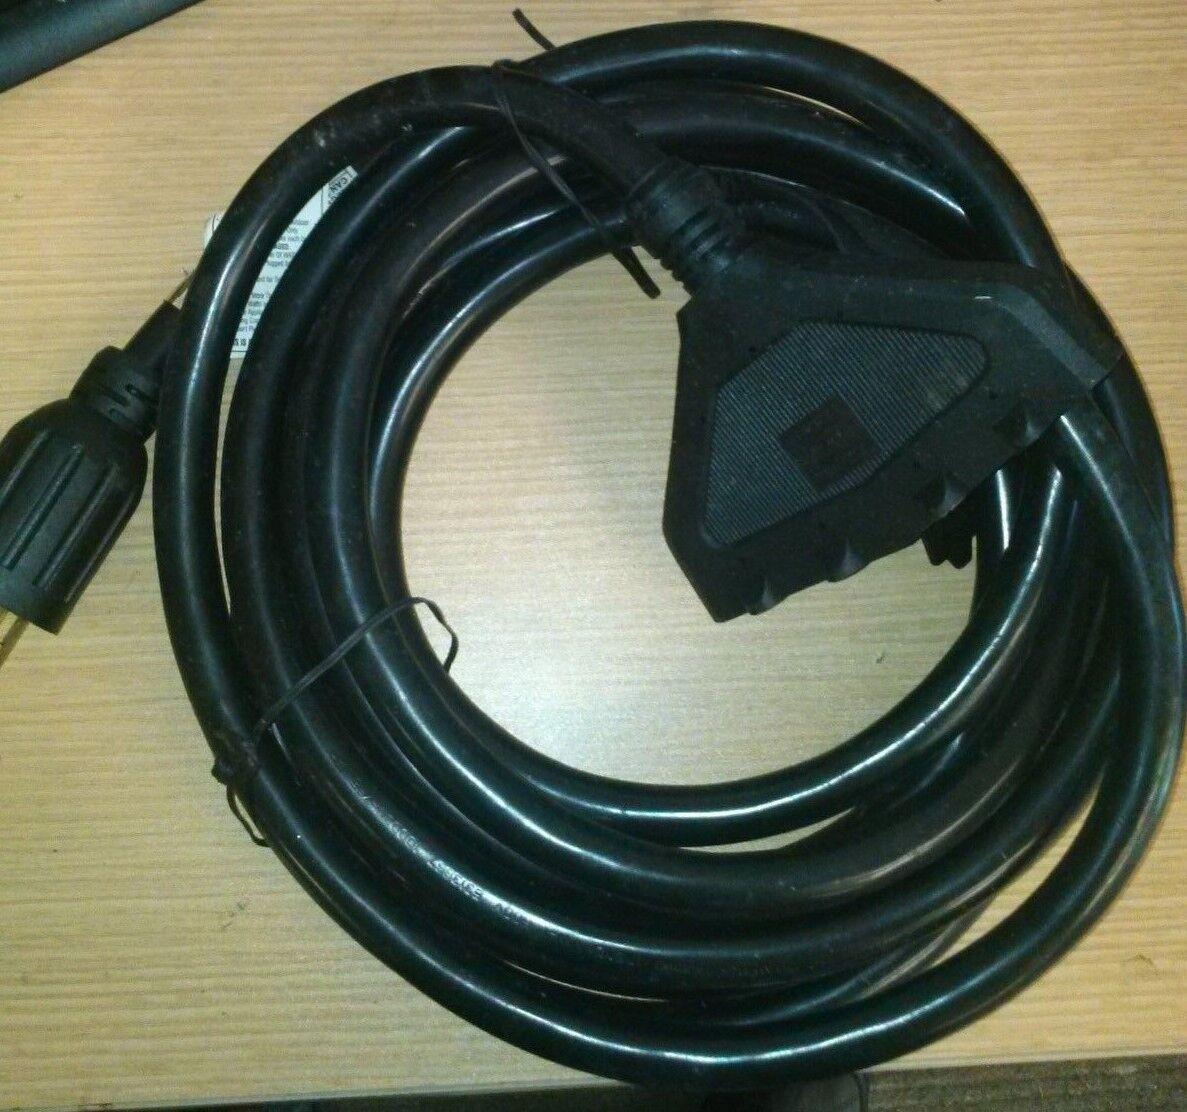 generac generator power cord 25ft 10 gauge